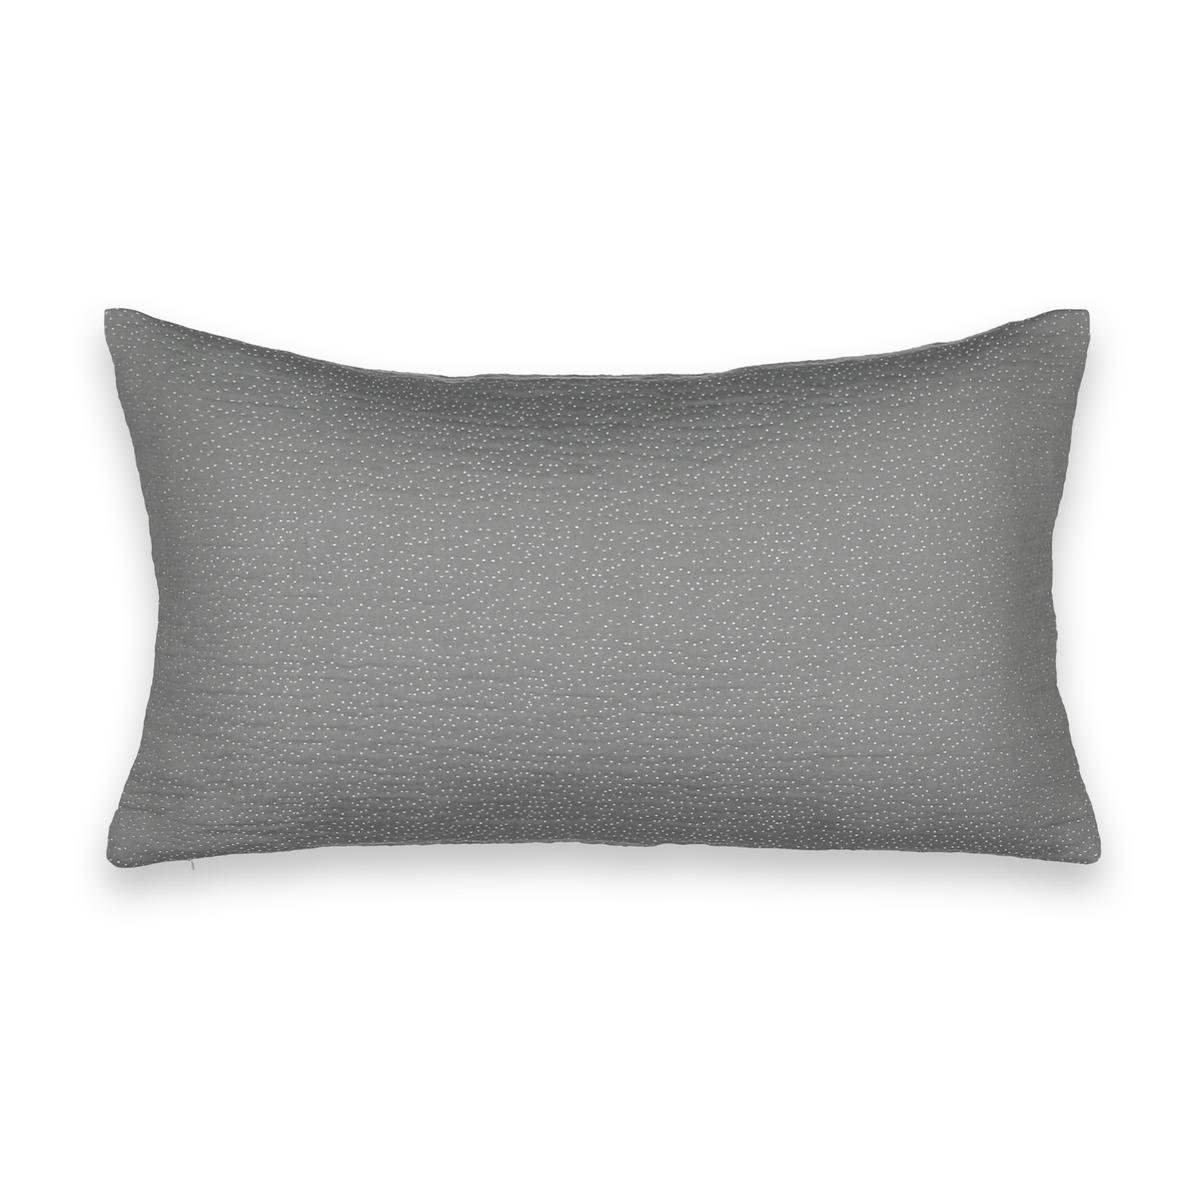 Чехол на подушку с вышивкой, Wogeka